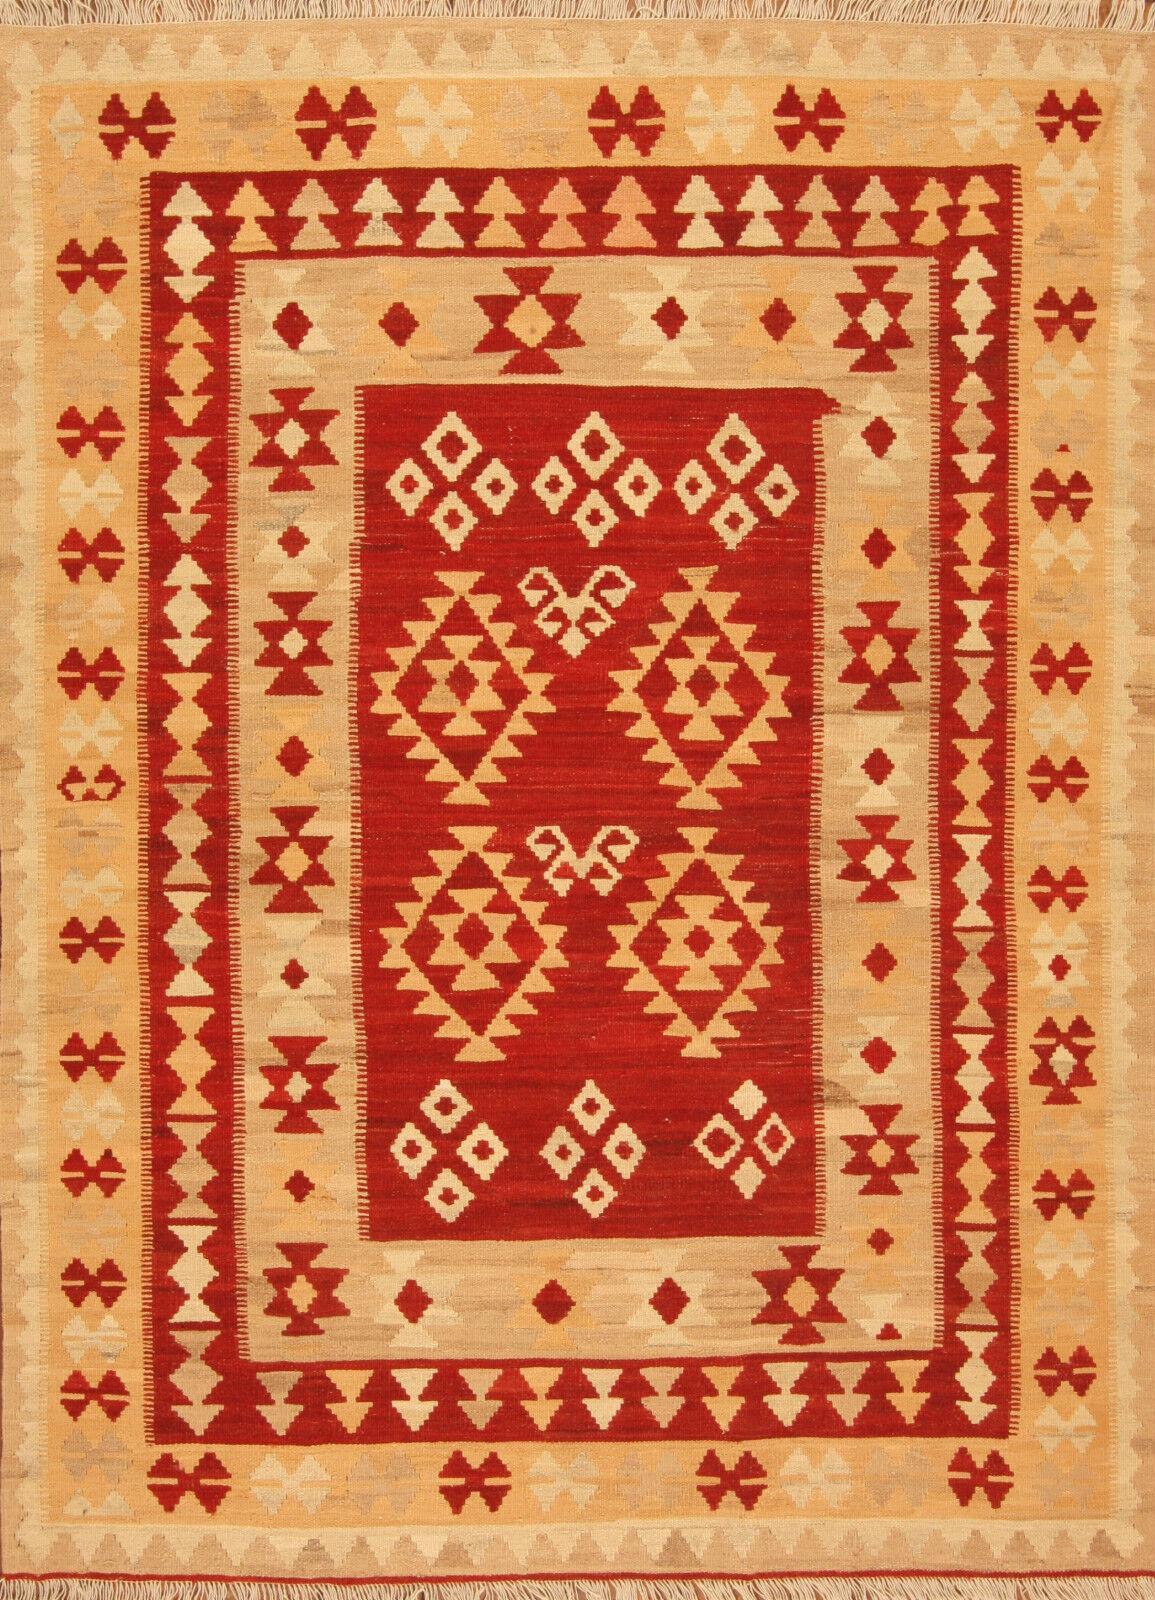 Orient alfombra handgewebter Kilim 1630 (201 x 146) cm nuevo puente alfombra persa